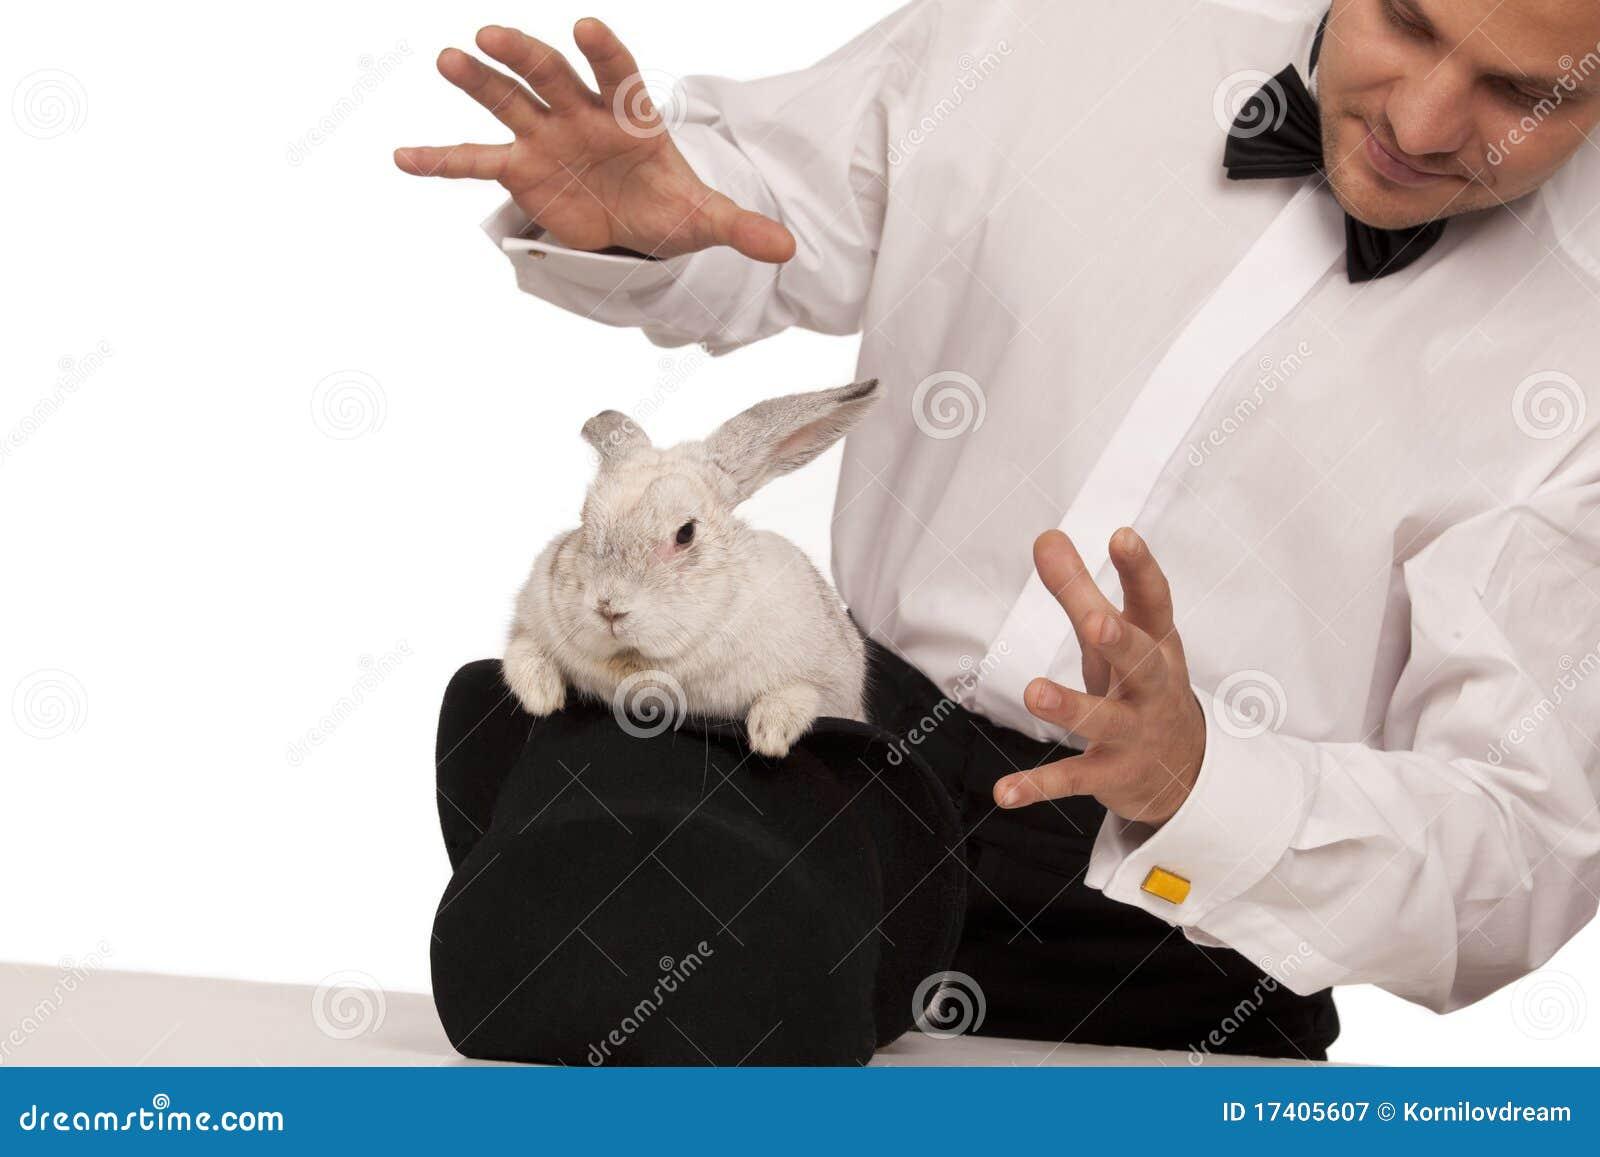 Magician Rabbit | www.imgkid.com - The Image Kid Has It!